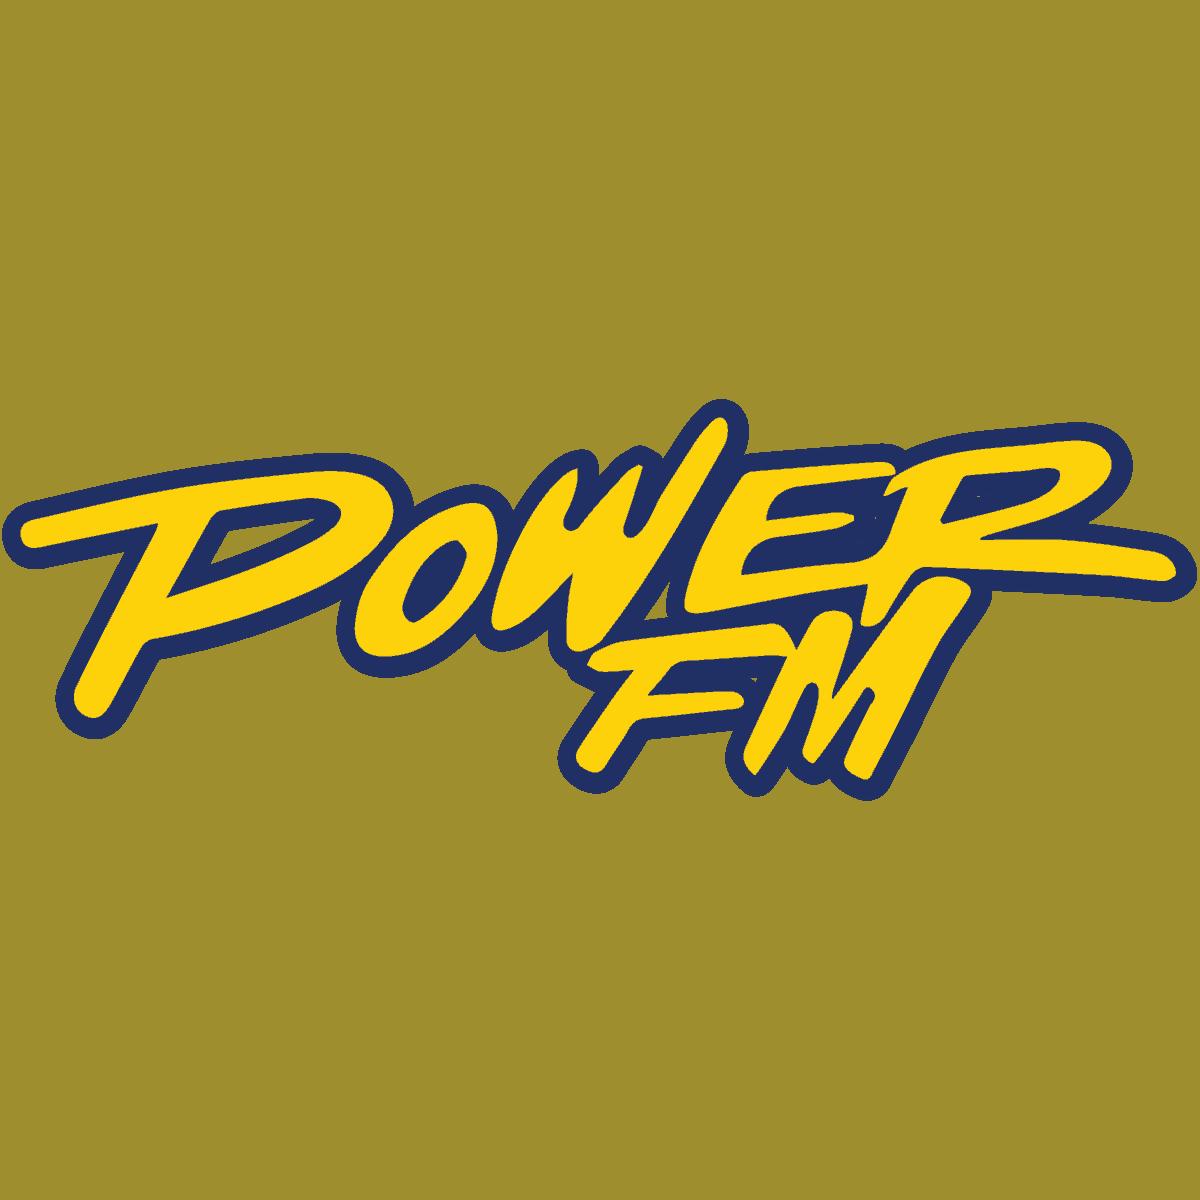 https://www.specialstrong.com/wp-content/uploads/2019/09/MUR_POWER_FM_2265531_config_station_logo_image_1543892395.png